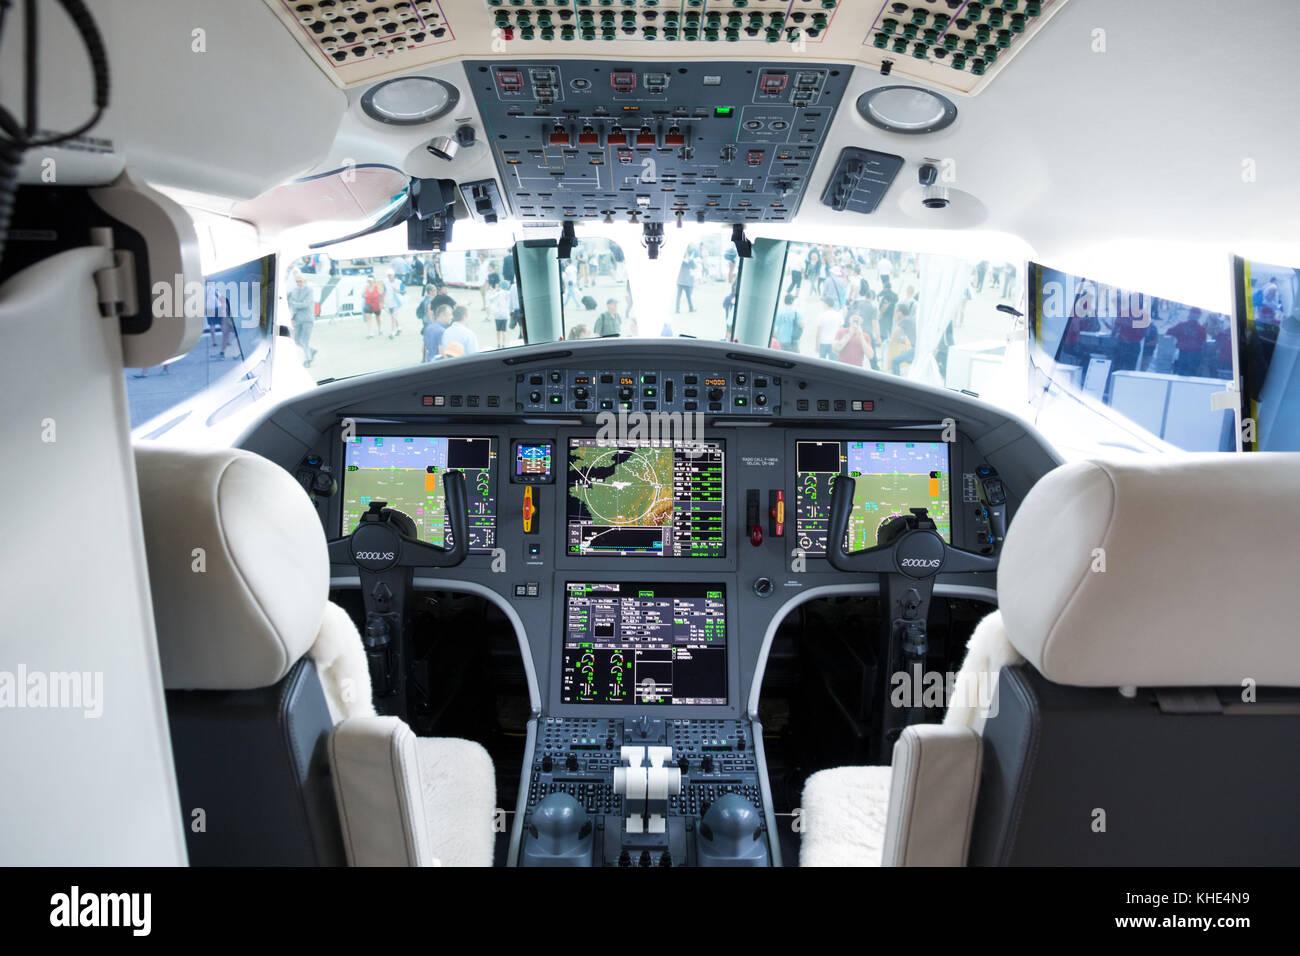 PARIS, FRANCE - JUN 23, 2017: Modern glass cockpit of the Dassault Falcon 2000LXS business jet at the Paris Air - Stock Image